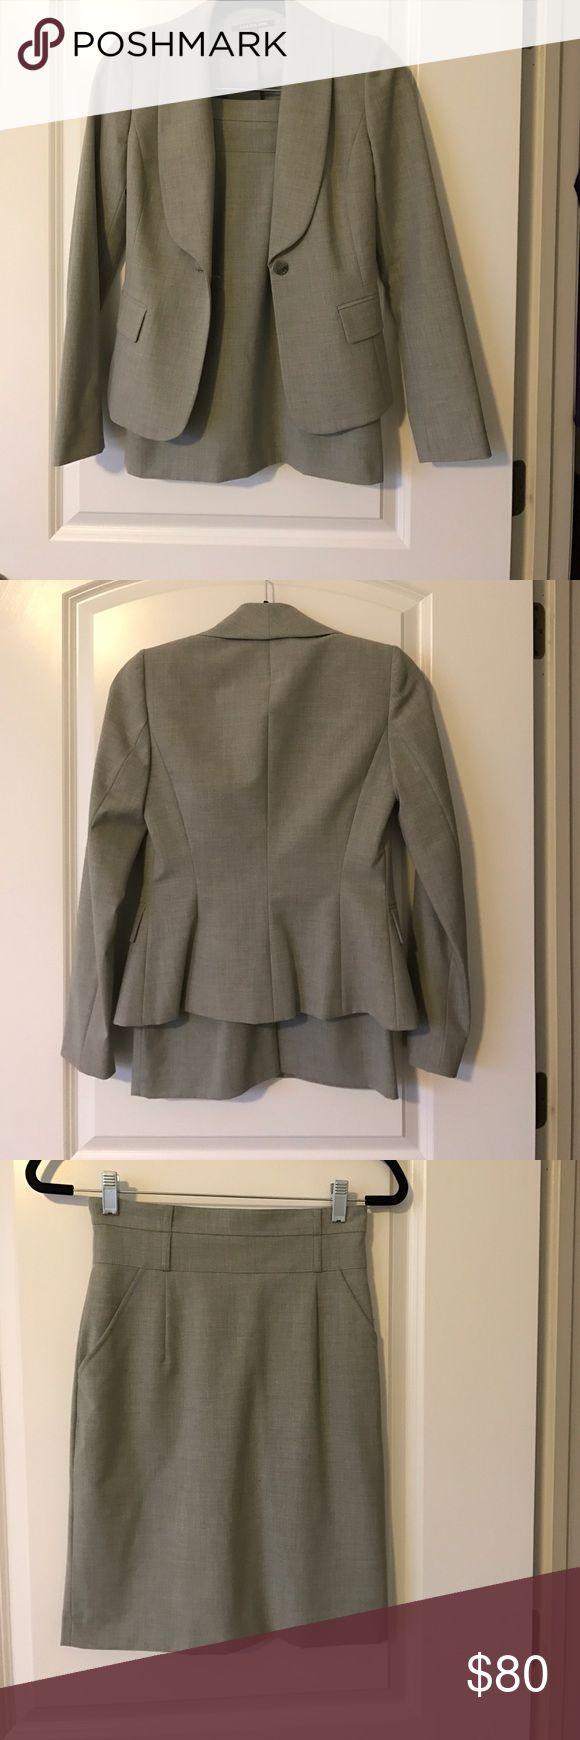 ideas about my first job first job good skirt suit high waisted pocketed skirt